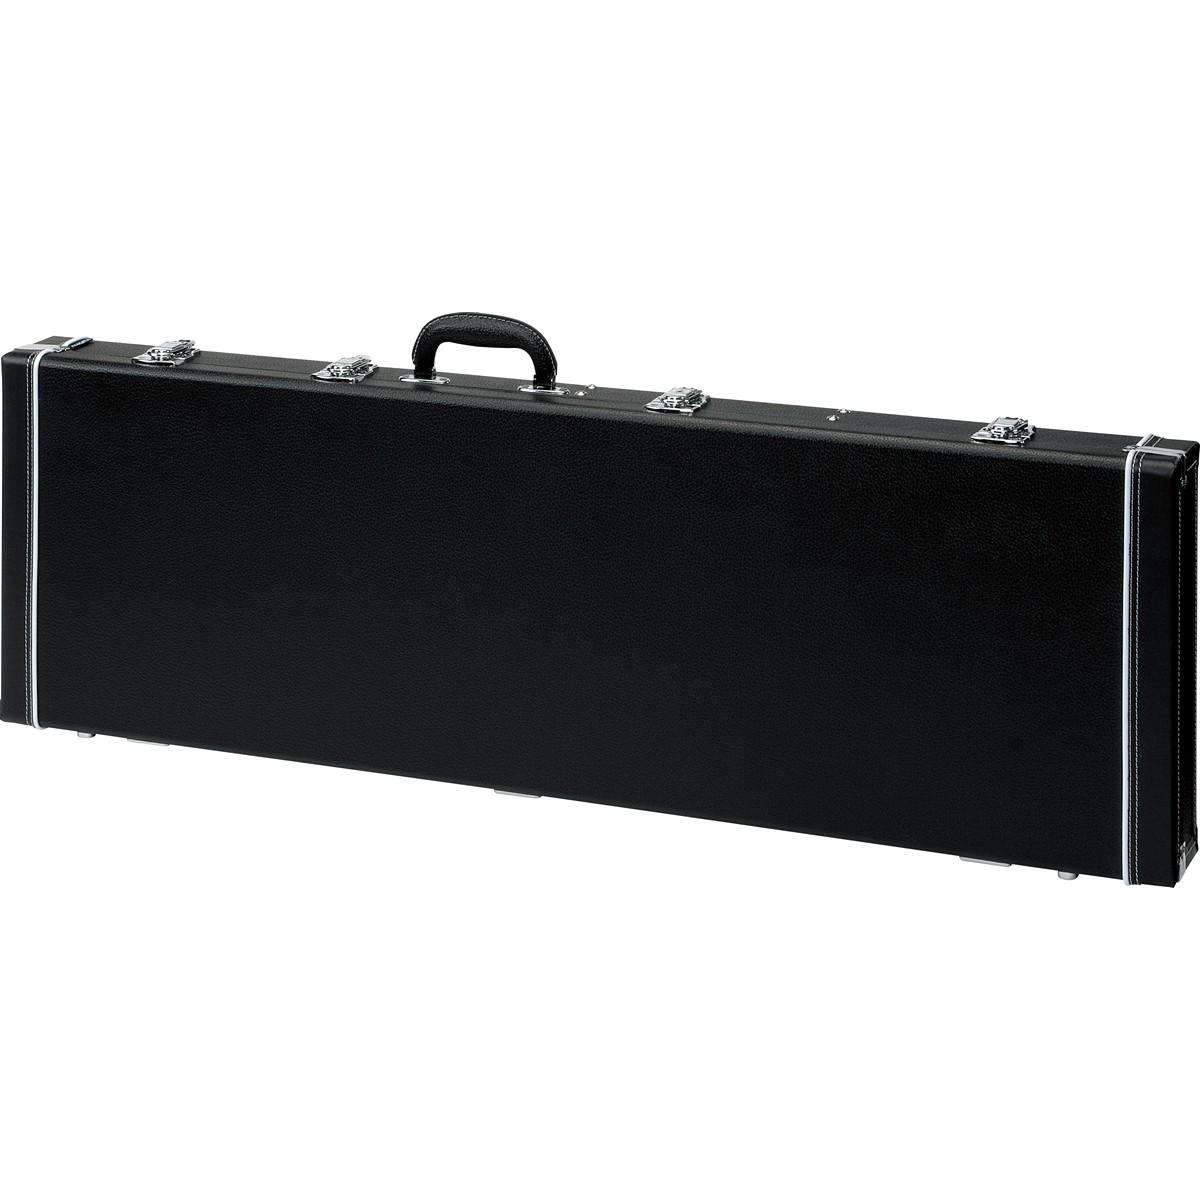 IBANEZ W250C  POWERPAD WOODEN CASE ELECTRIC GUITAR